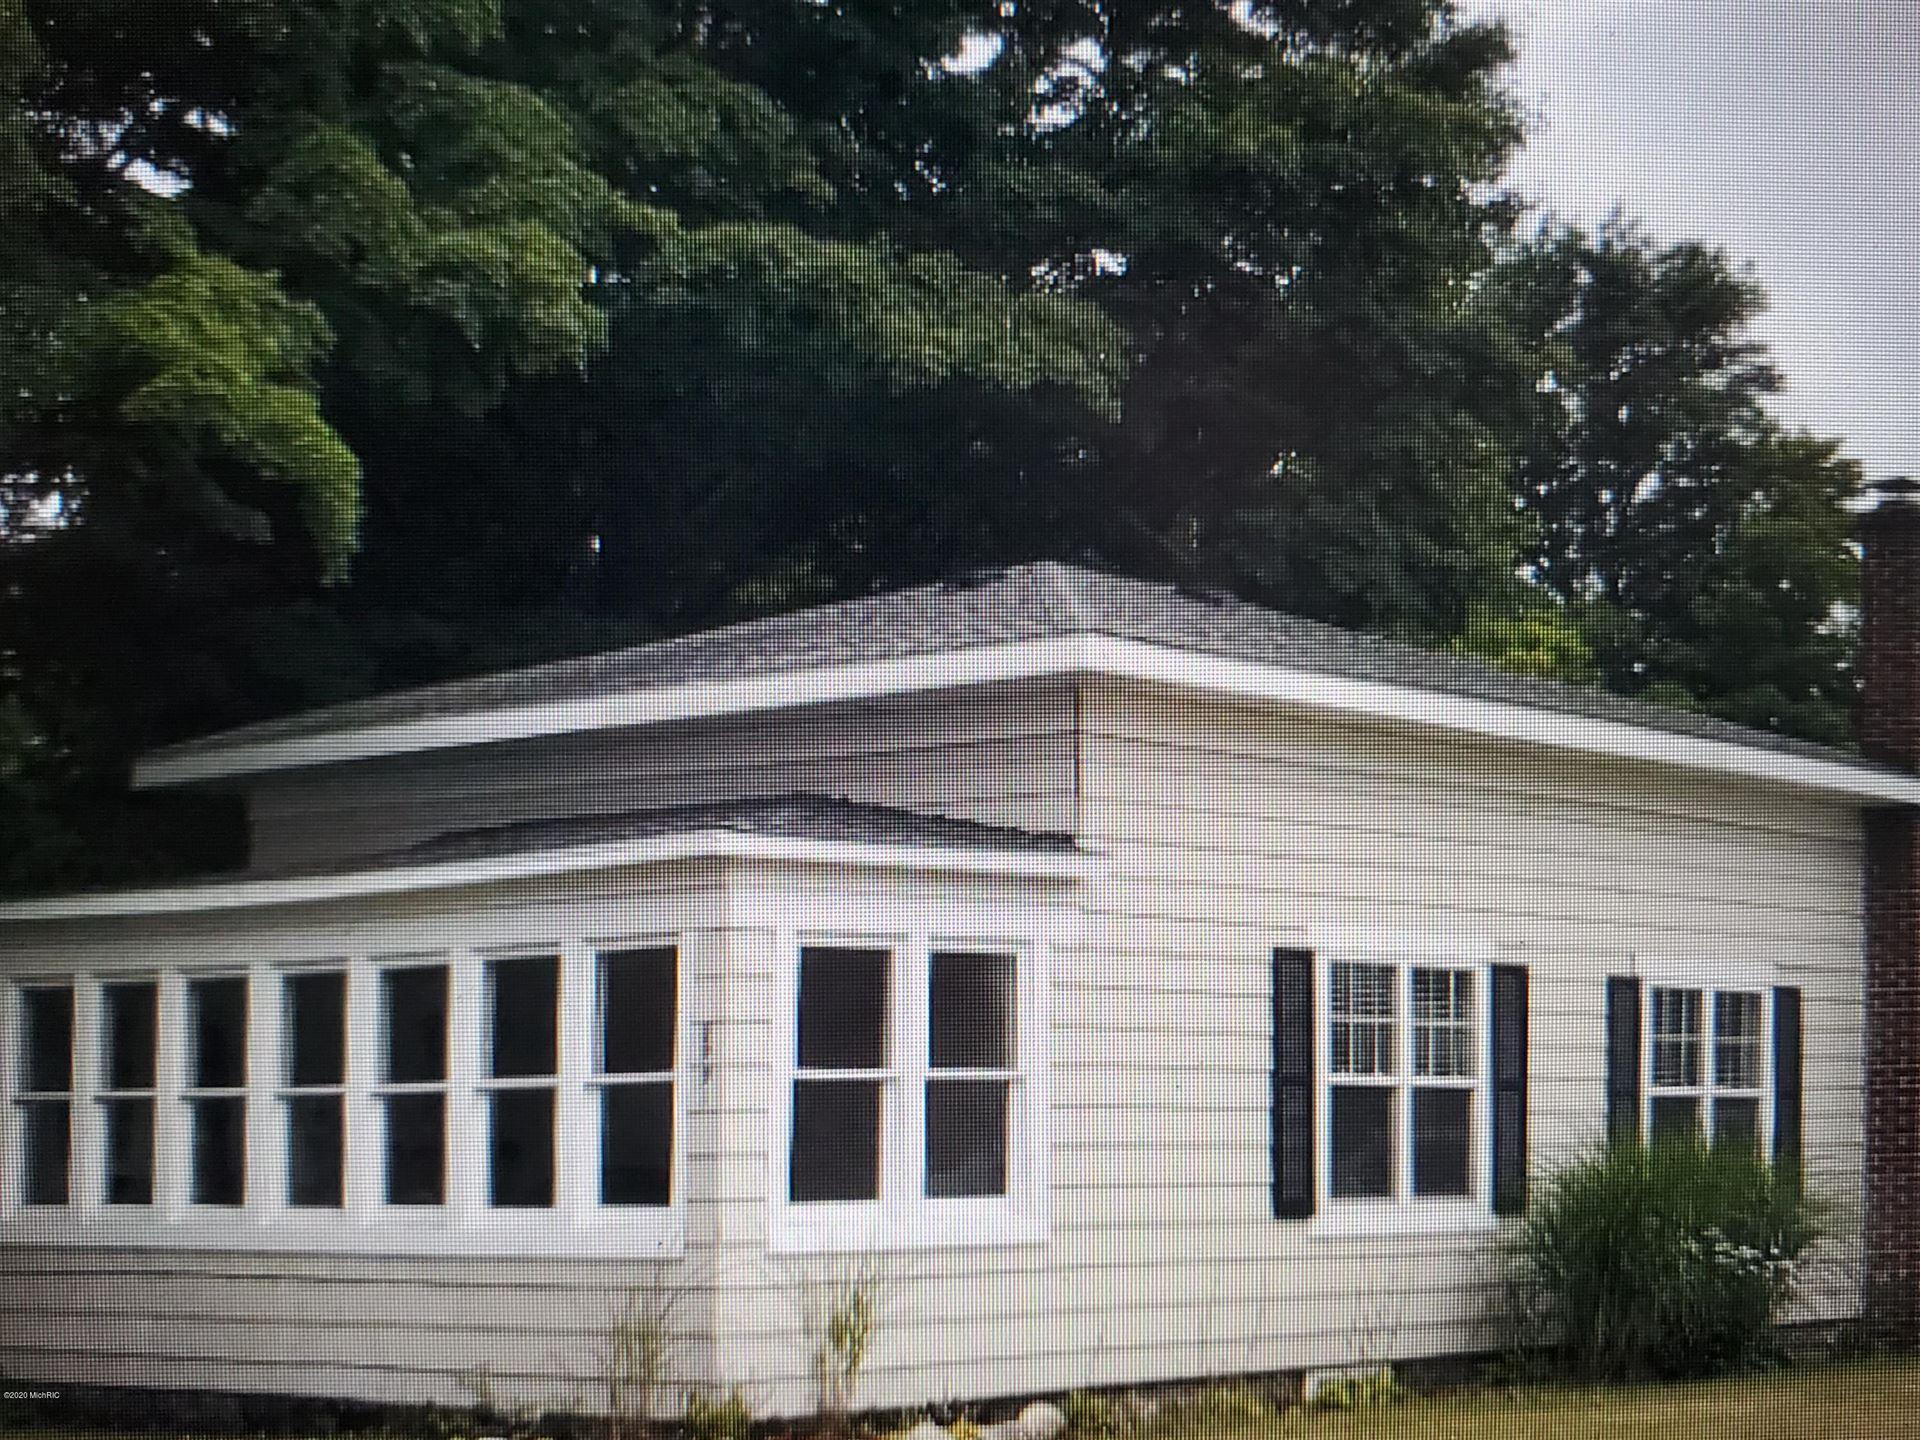 8991 Stebbins Street, Montague, MI 49437 - #: 20015809